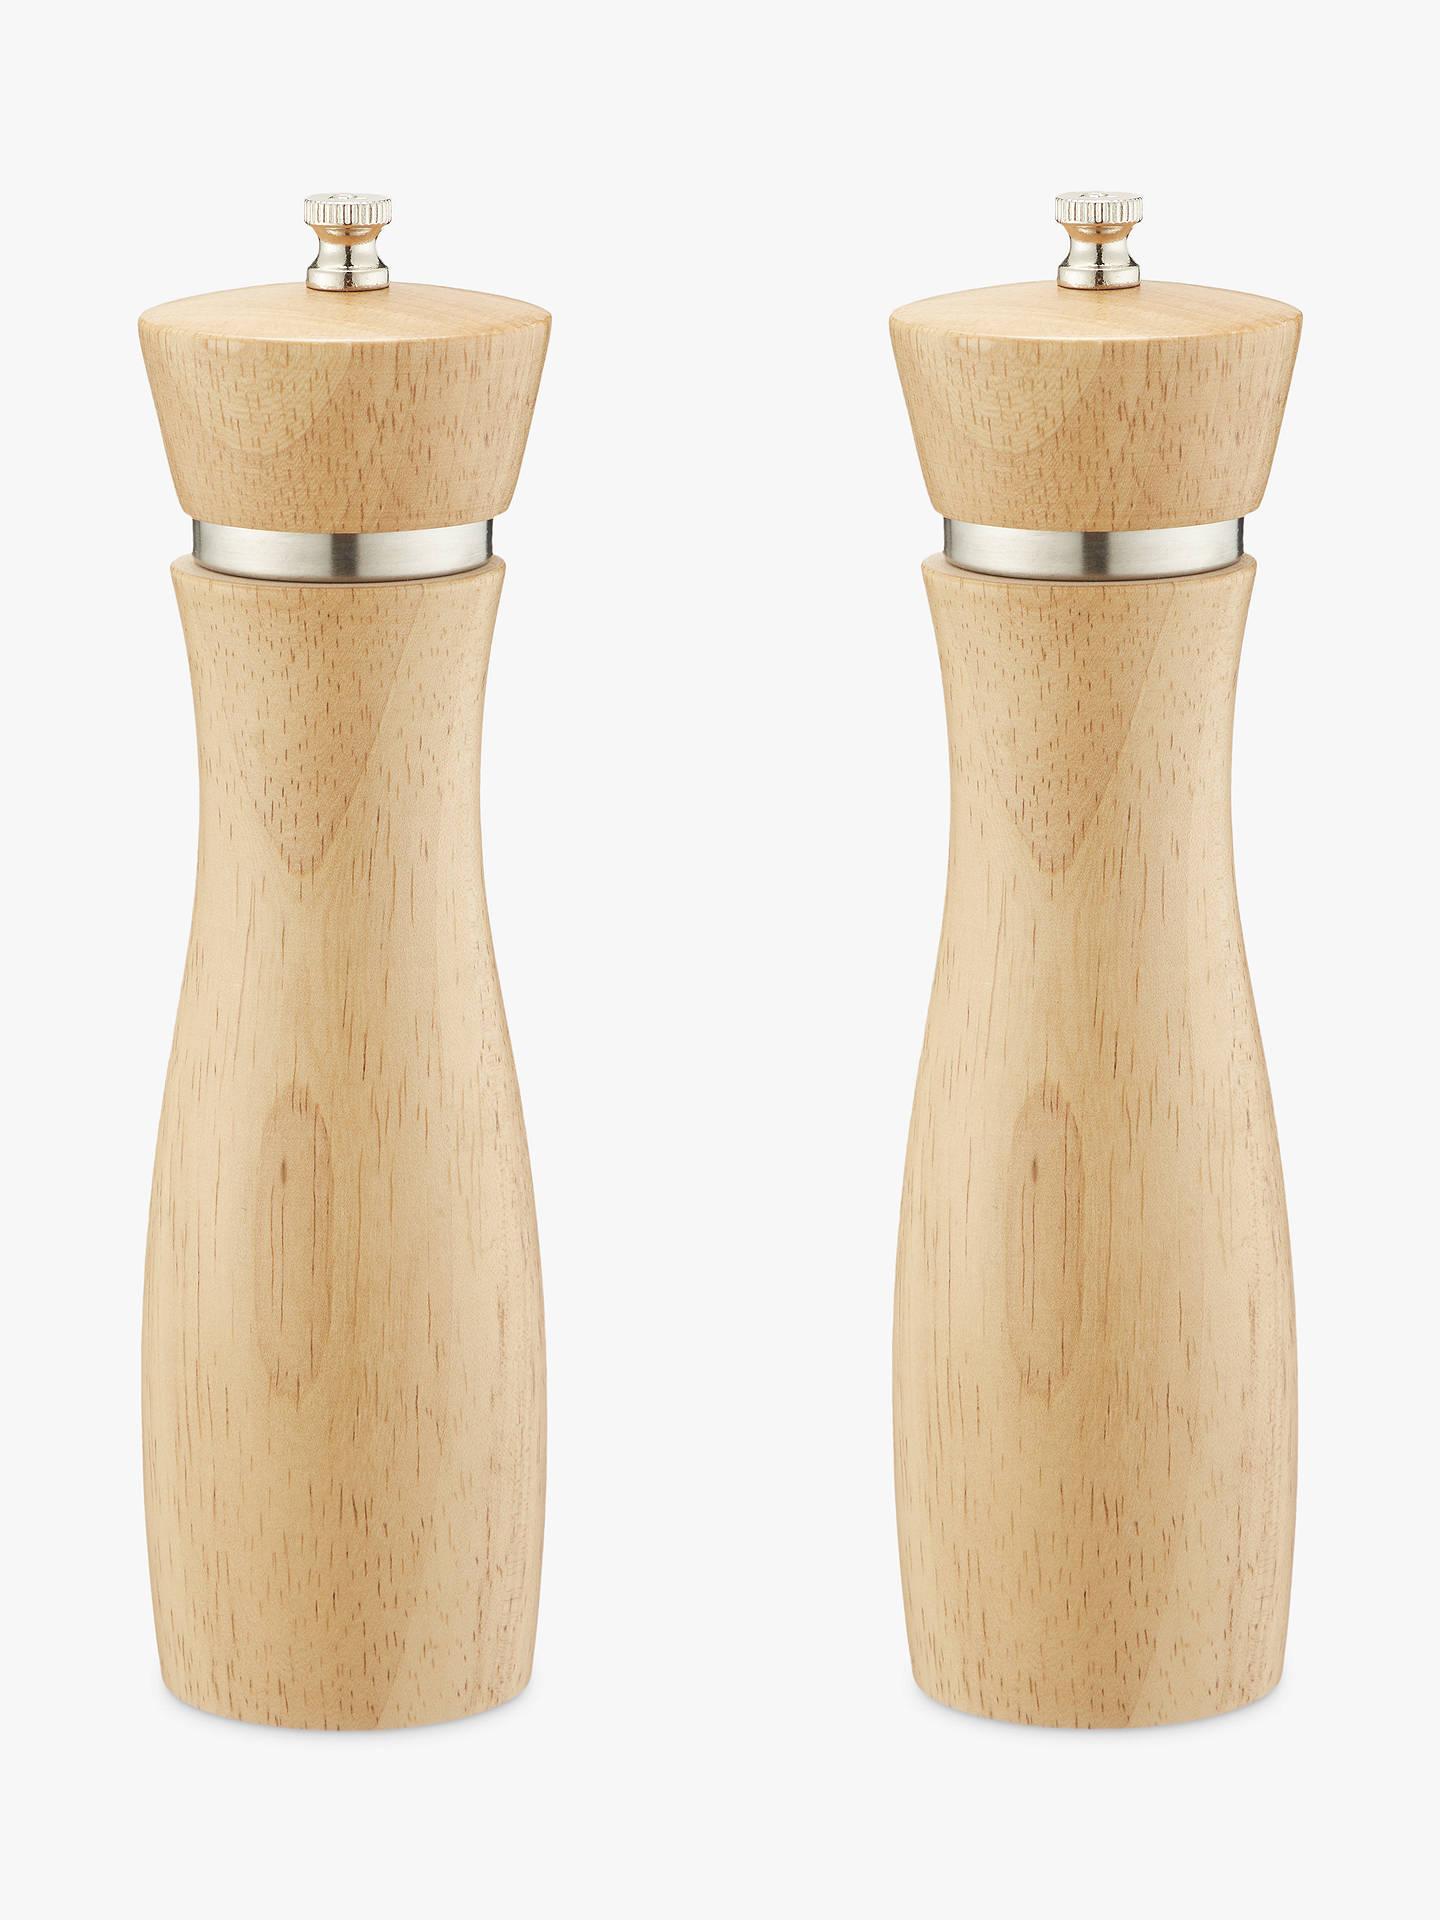 John Lewis Partners Rubber Wood Tall Salt And Pepper Mills Natural Set Of